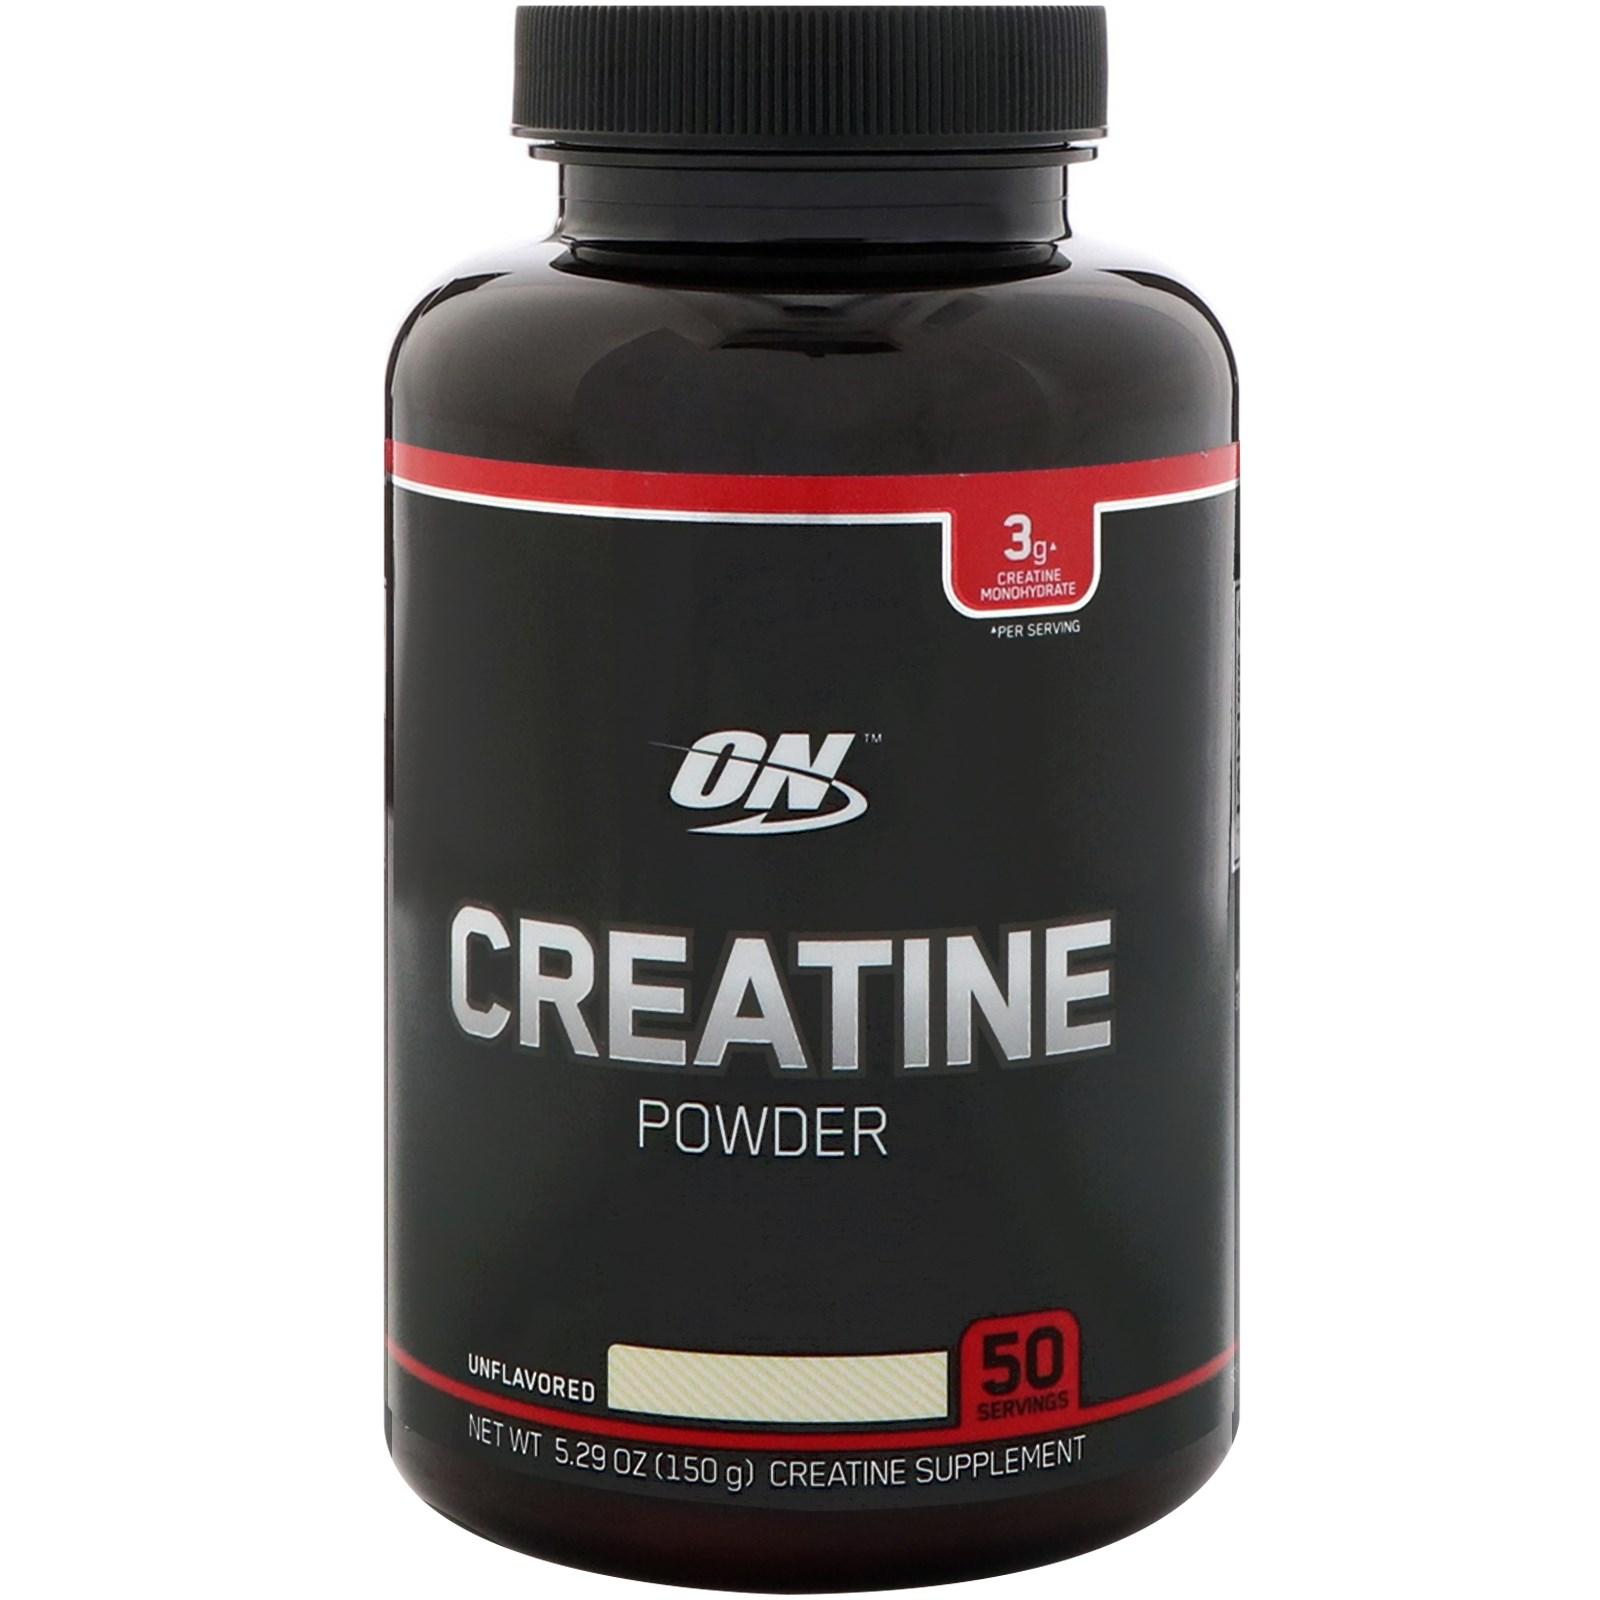 50g 1000g Food grade pure creatine extract powder, kreatin